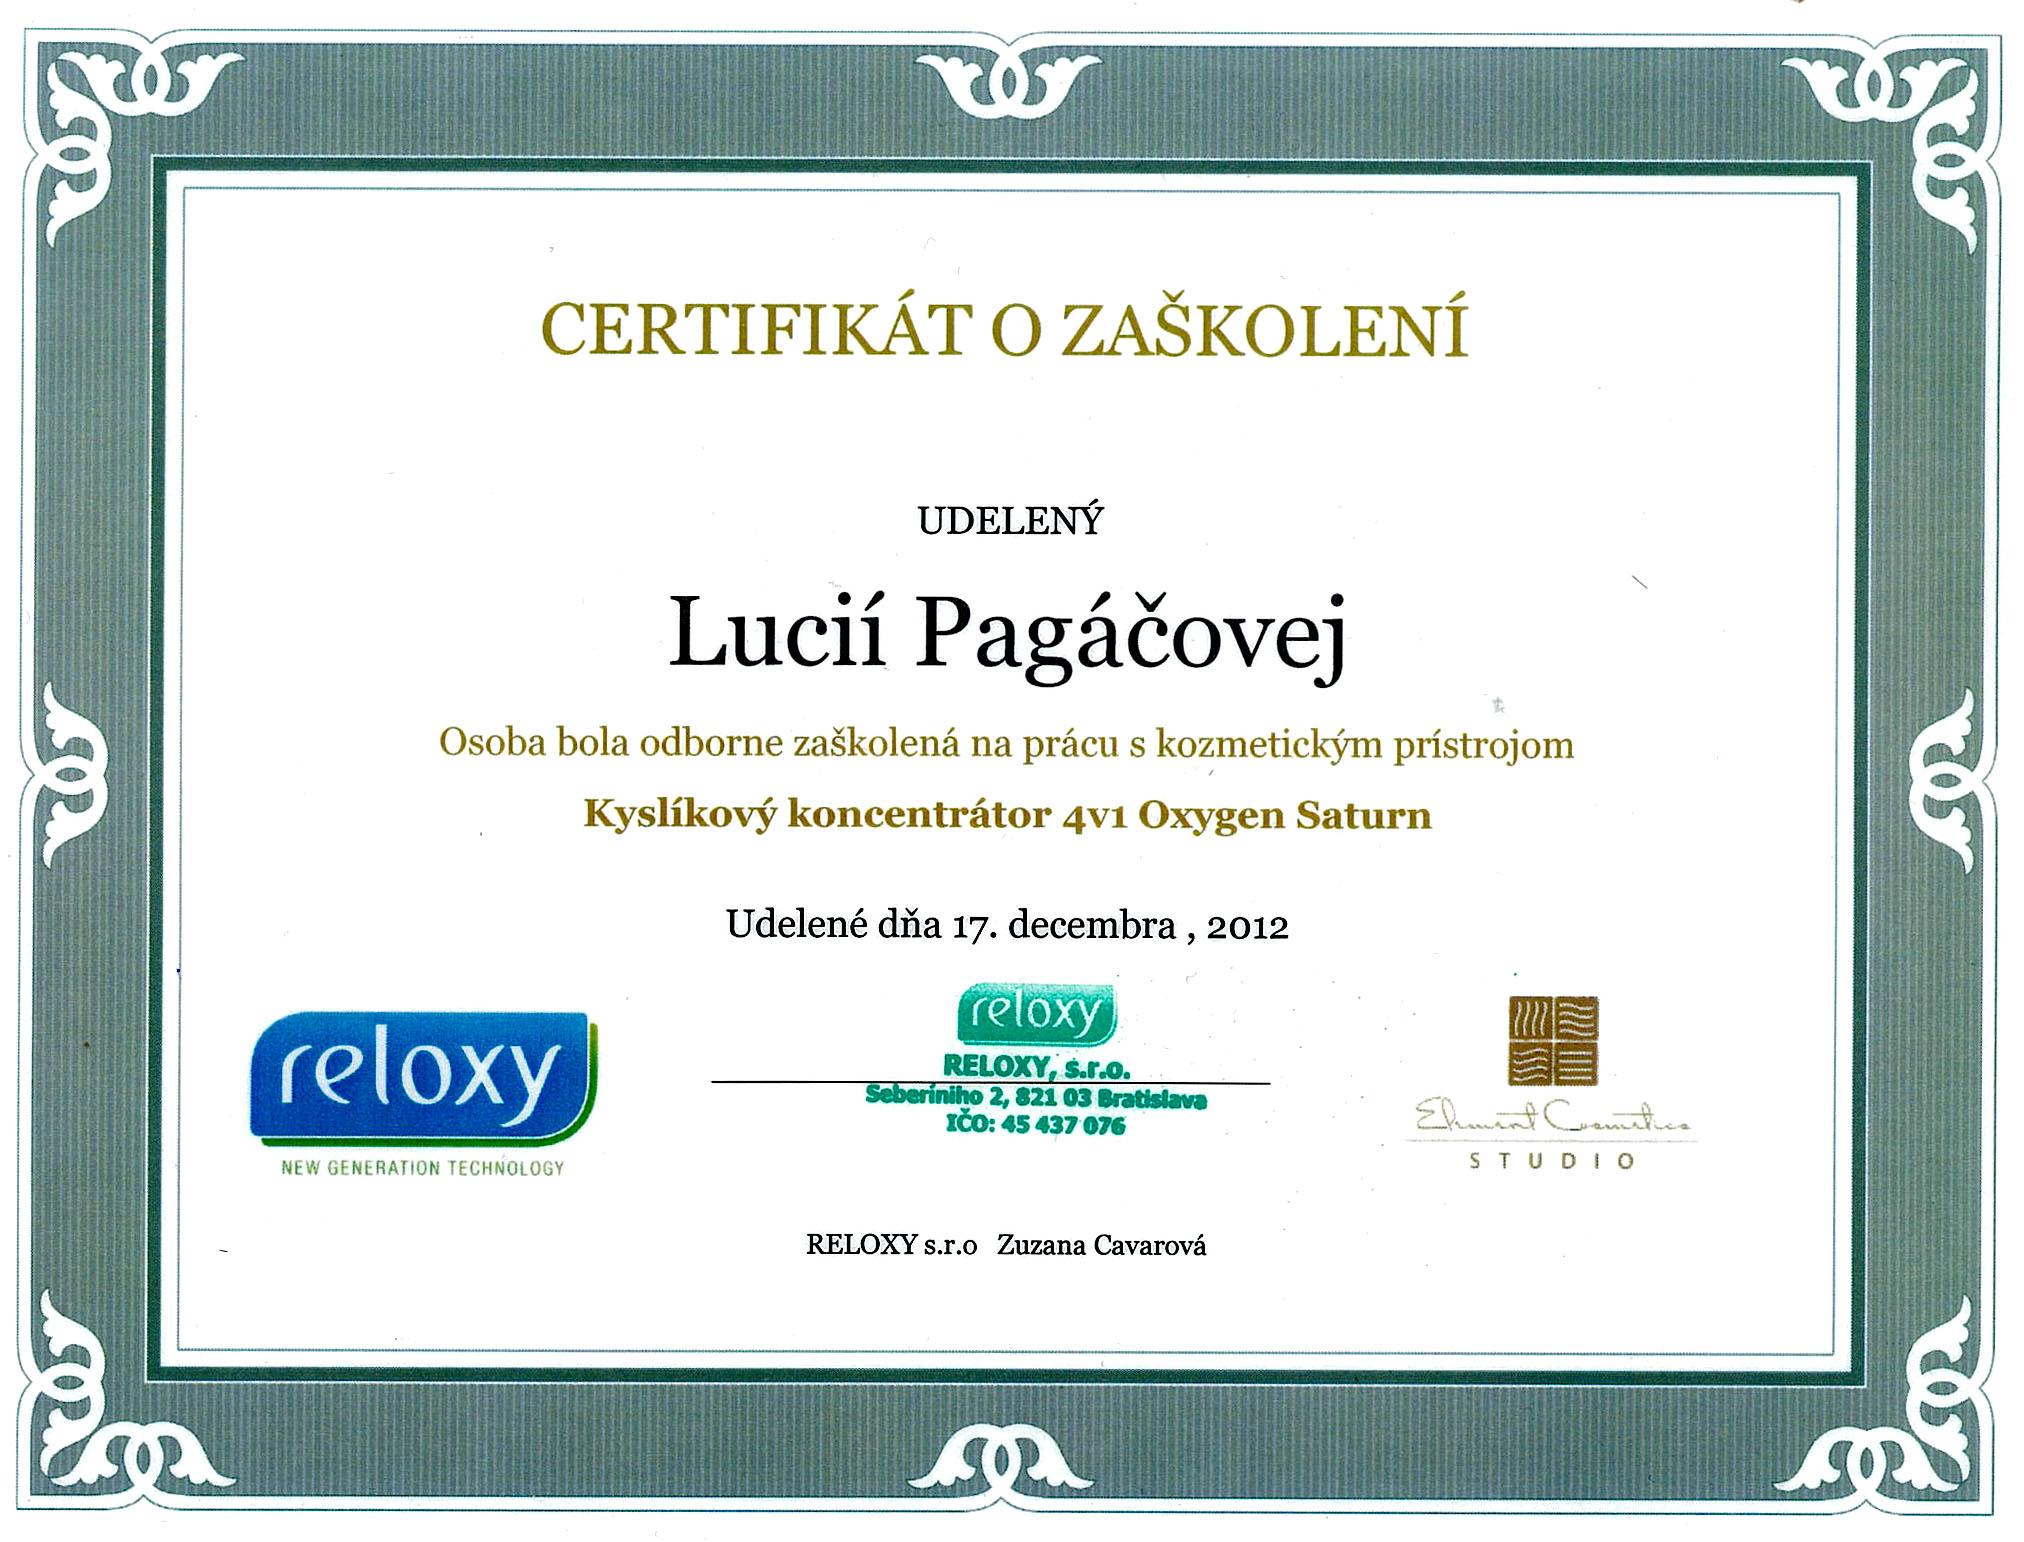 certifikat-reloxy-bratilava